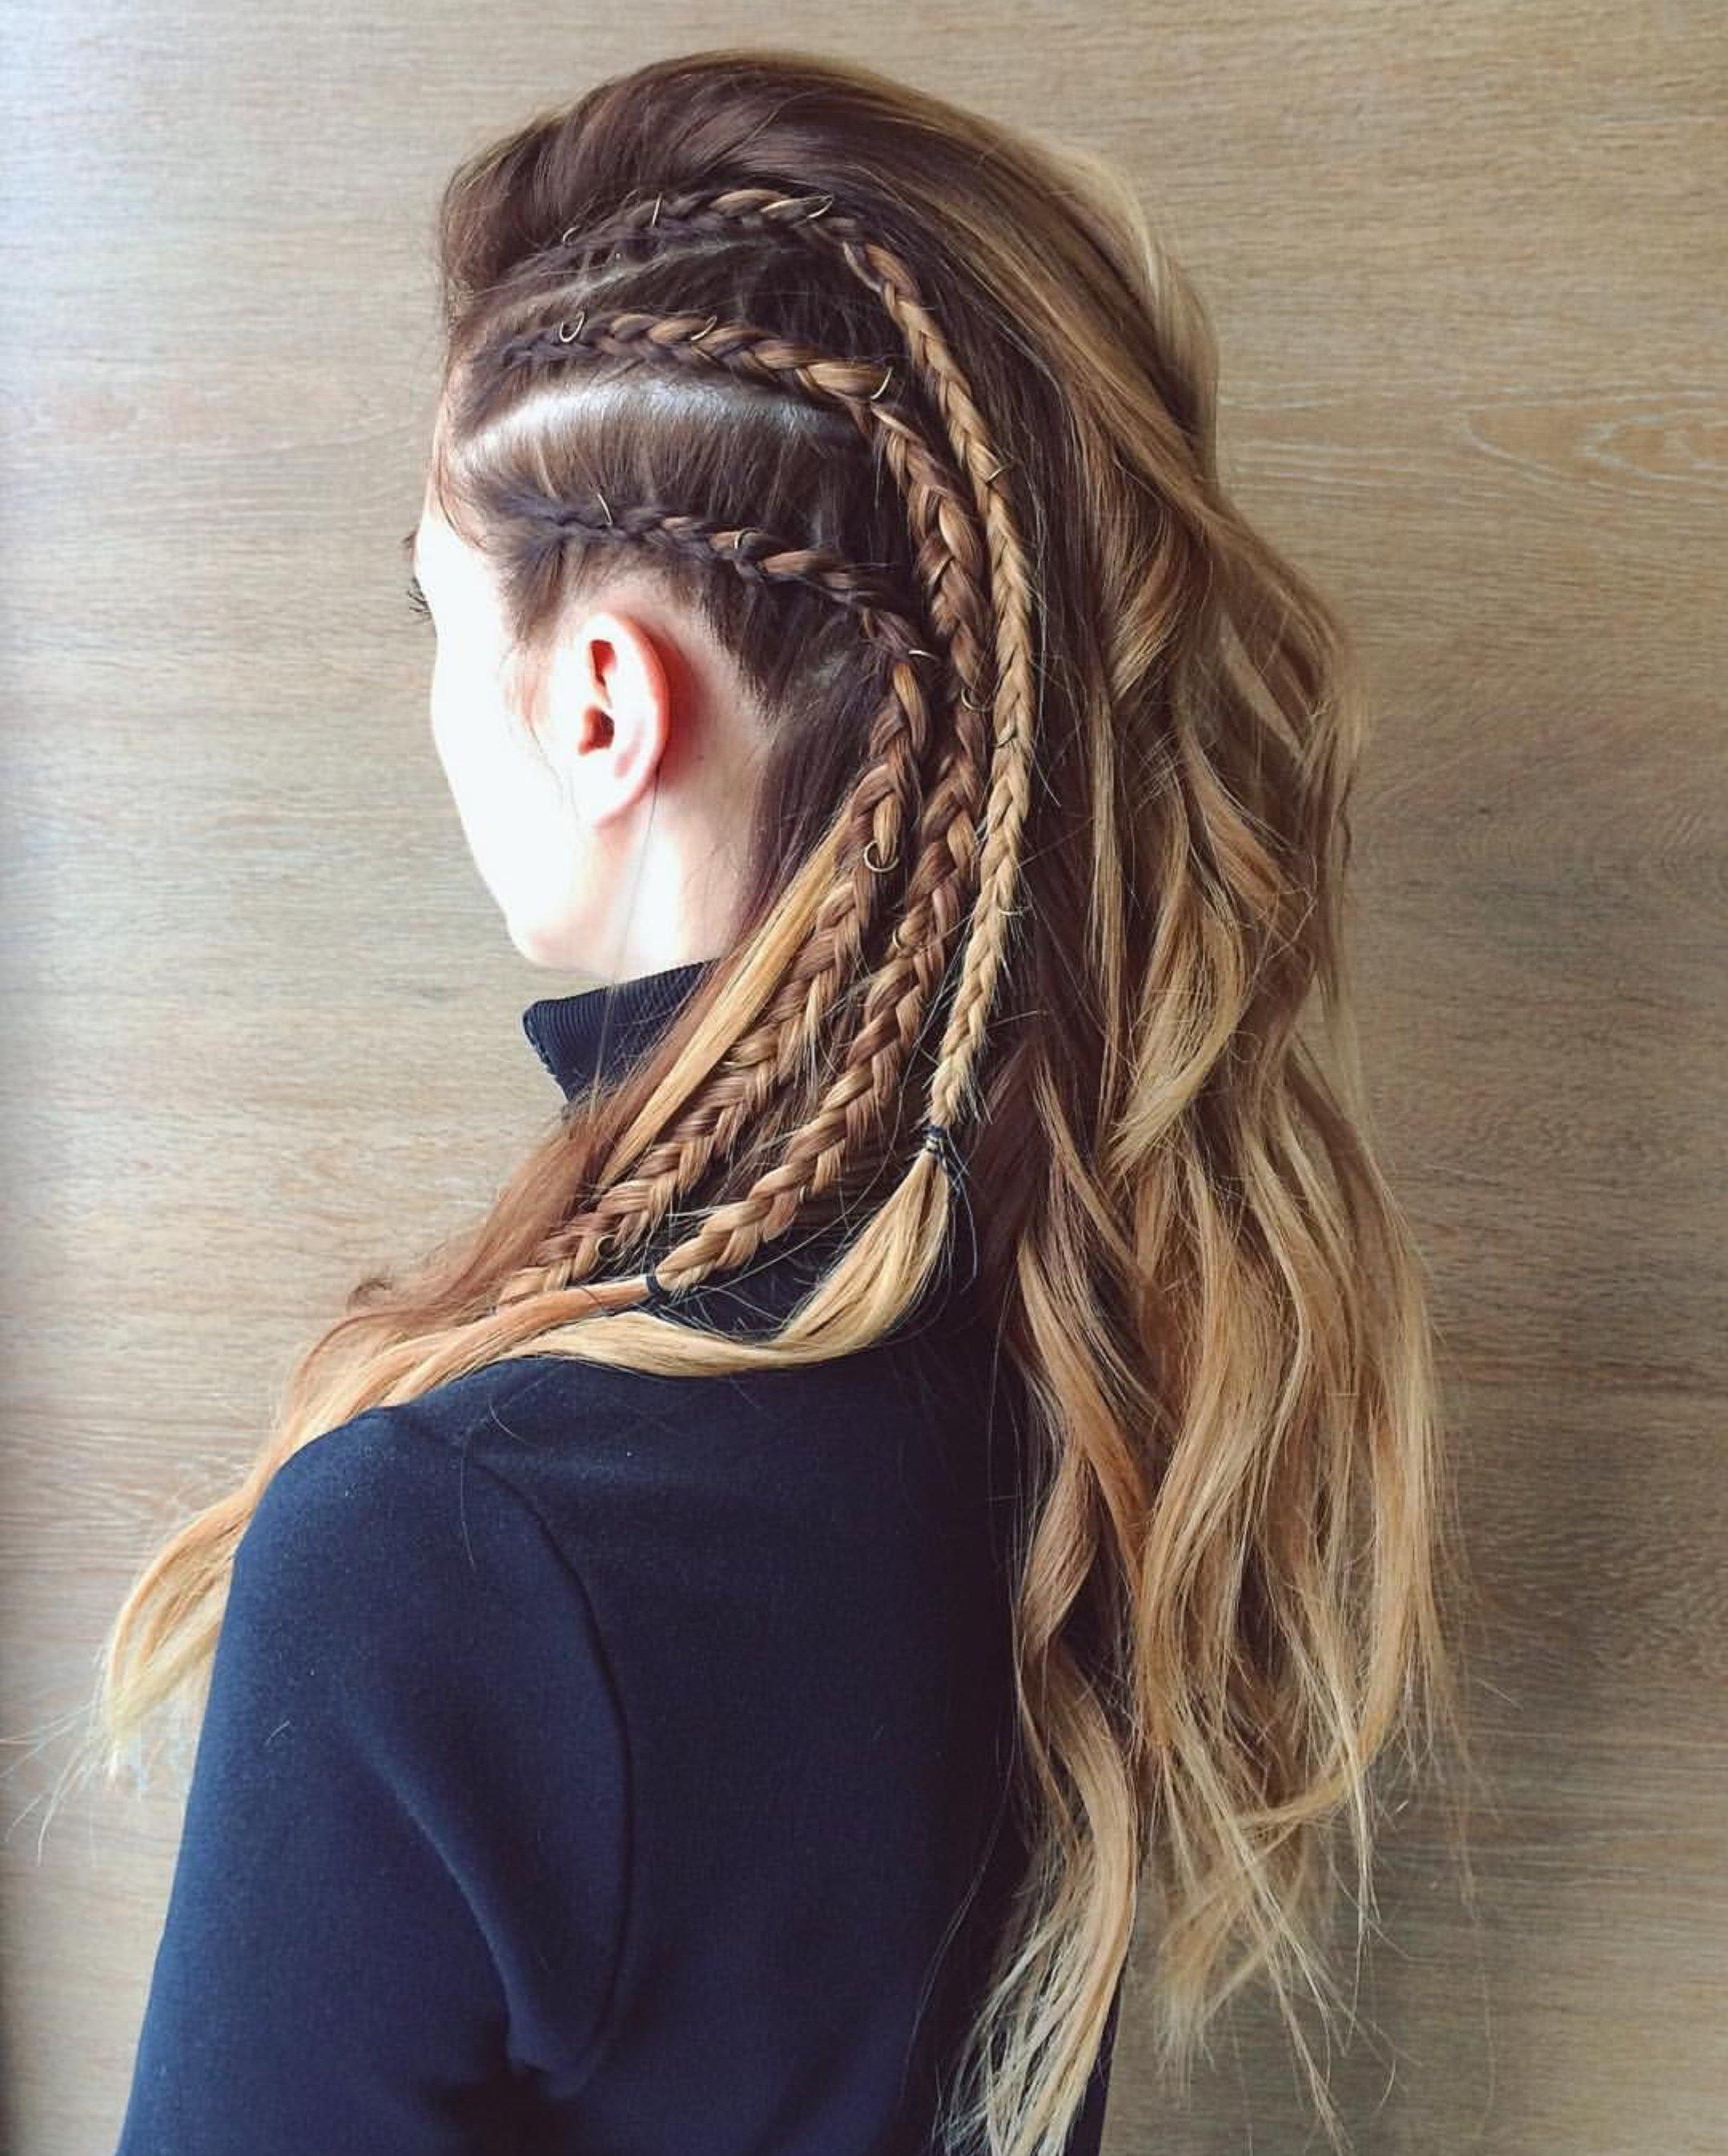 Espectacular vikingos peinados Fotos de cortes de pelo Consejos - Peinados con trenzas vikingas para darle rudeza a tu estilo